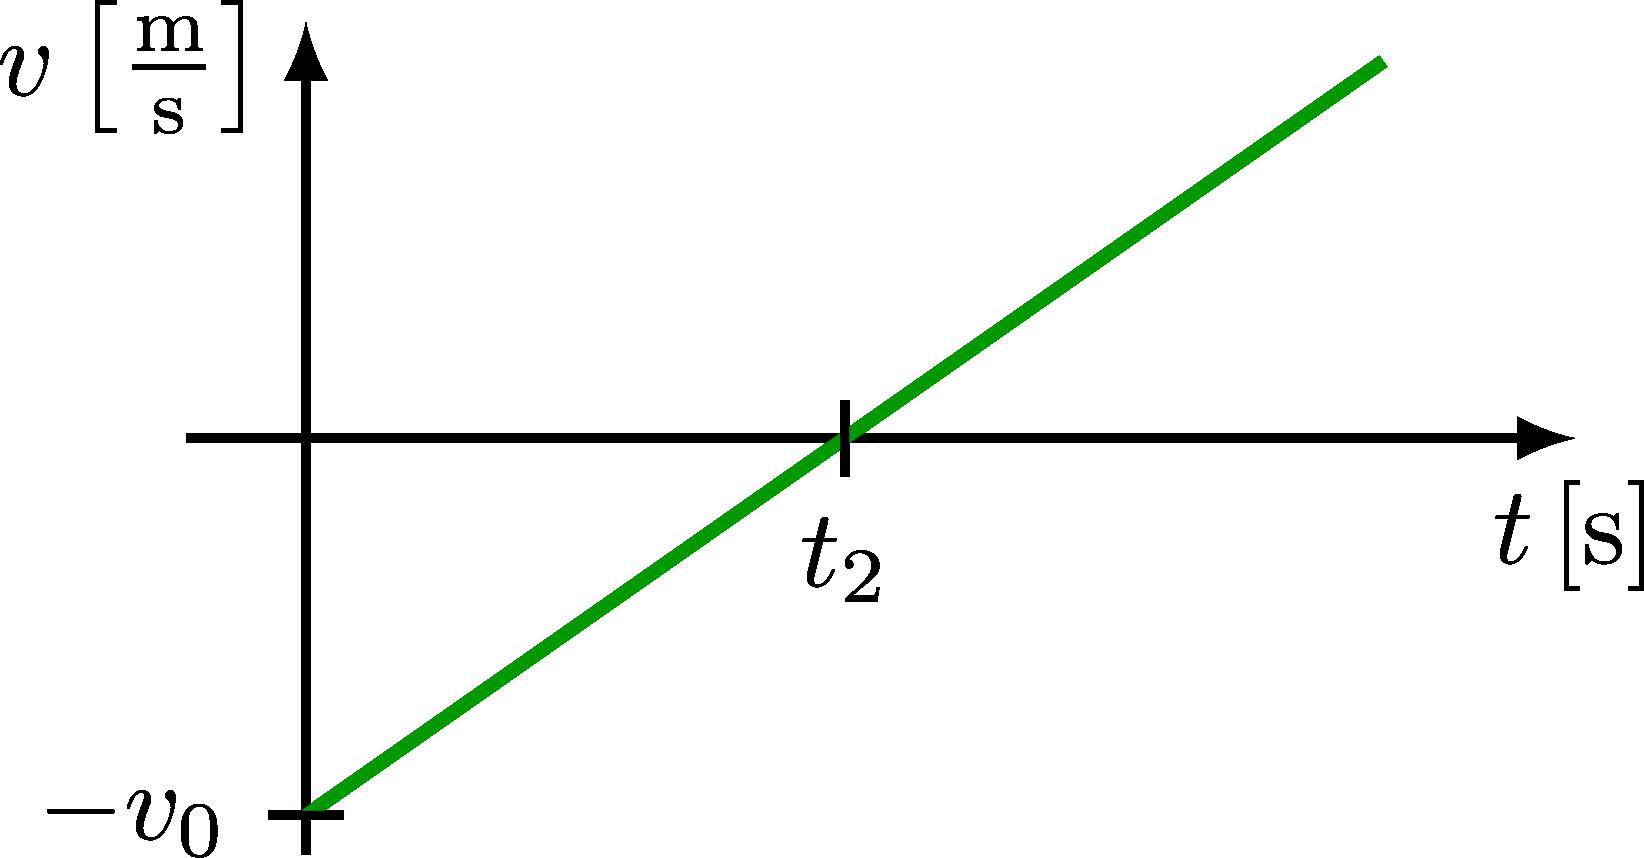 kinematics_curves-008.png